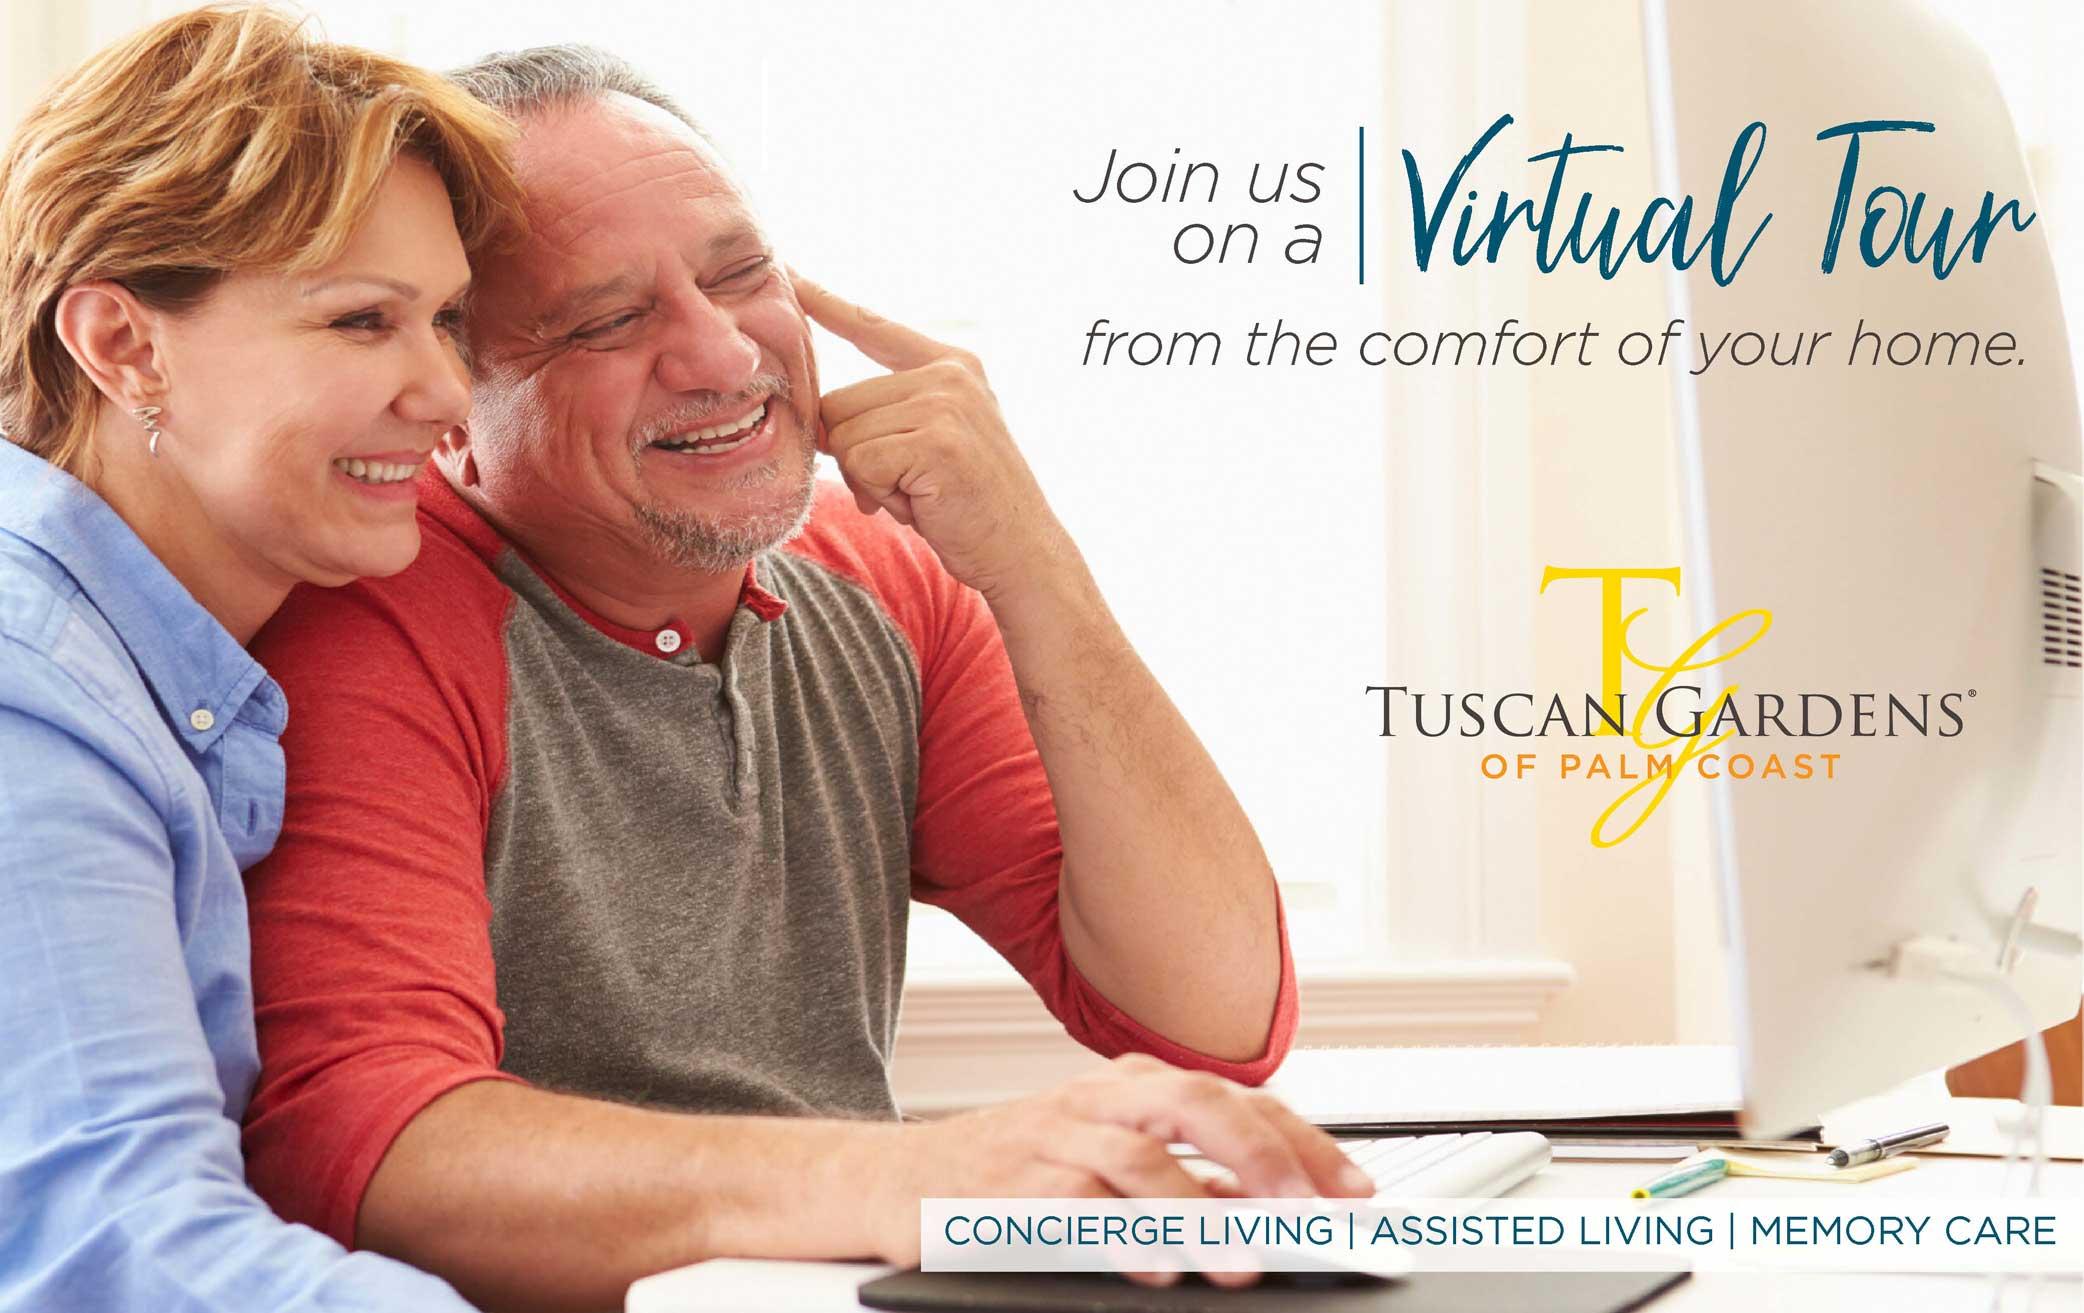 Tuscan Gardens palm coast virtual tour